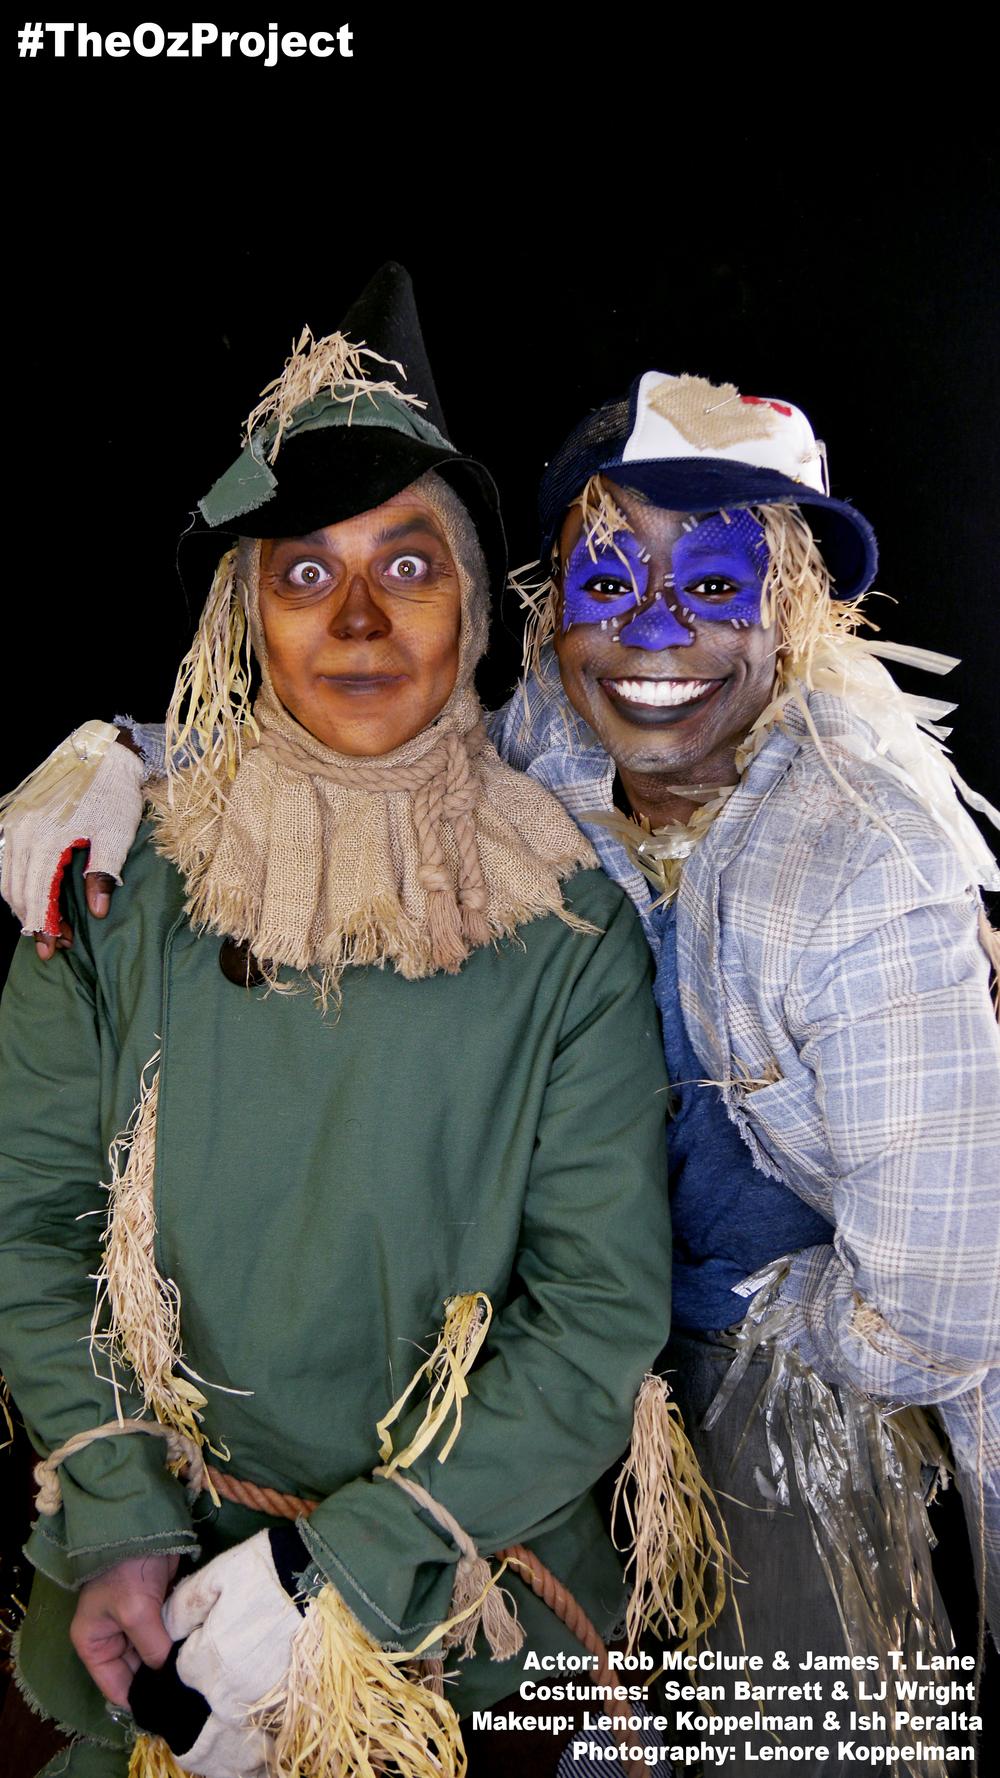 rob mcclure james t lane scarecrows TOP.jpg